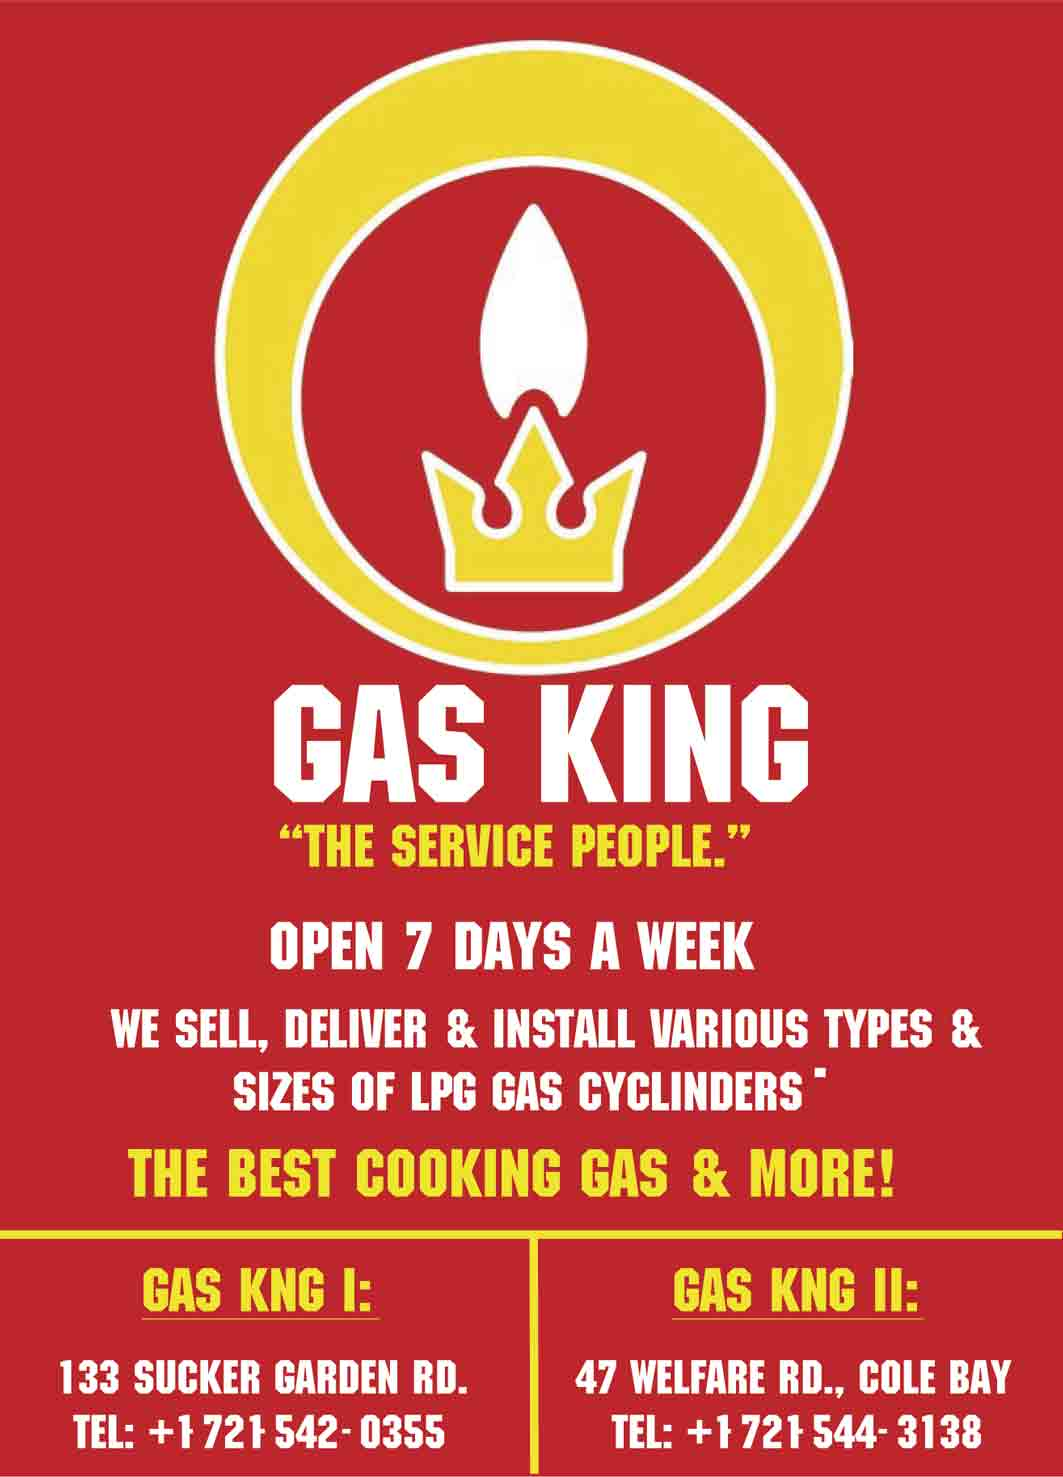 St Maarten Telephone Directory - Gas King